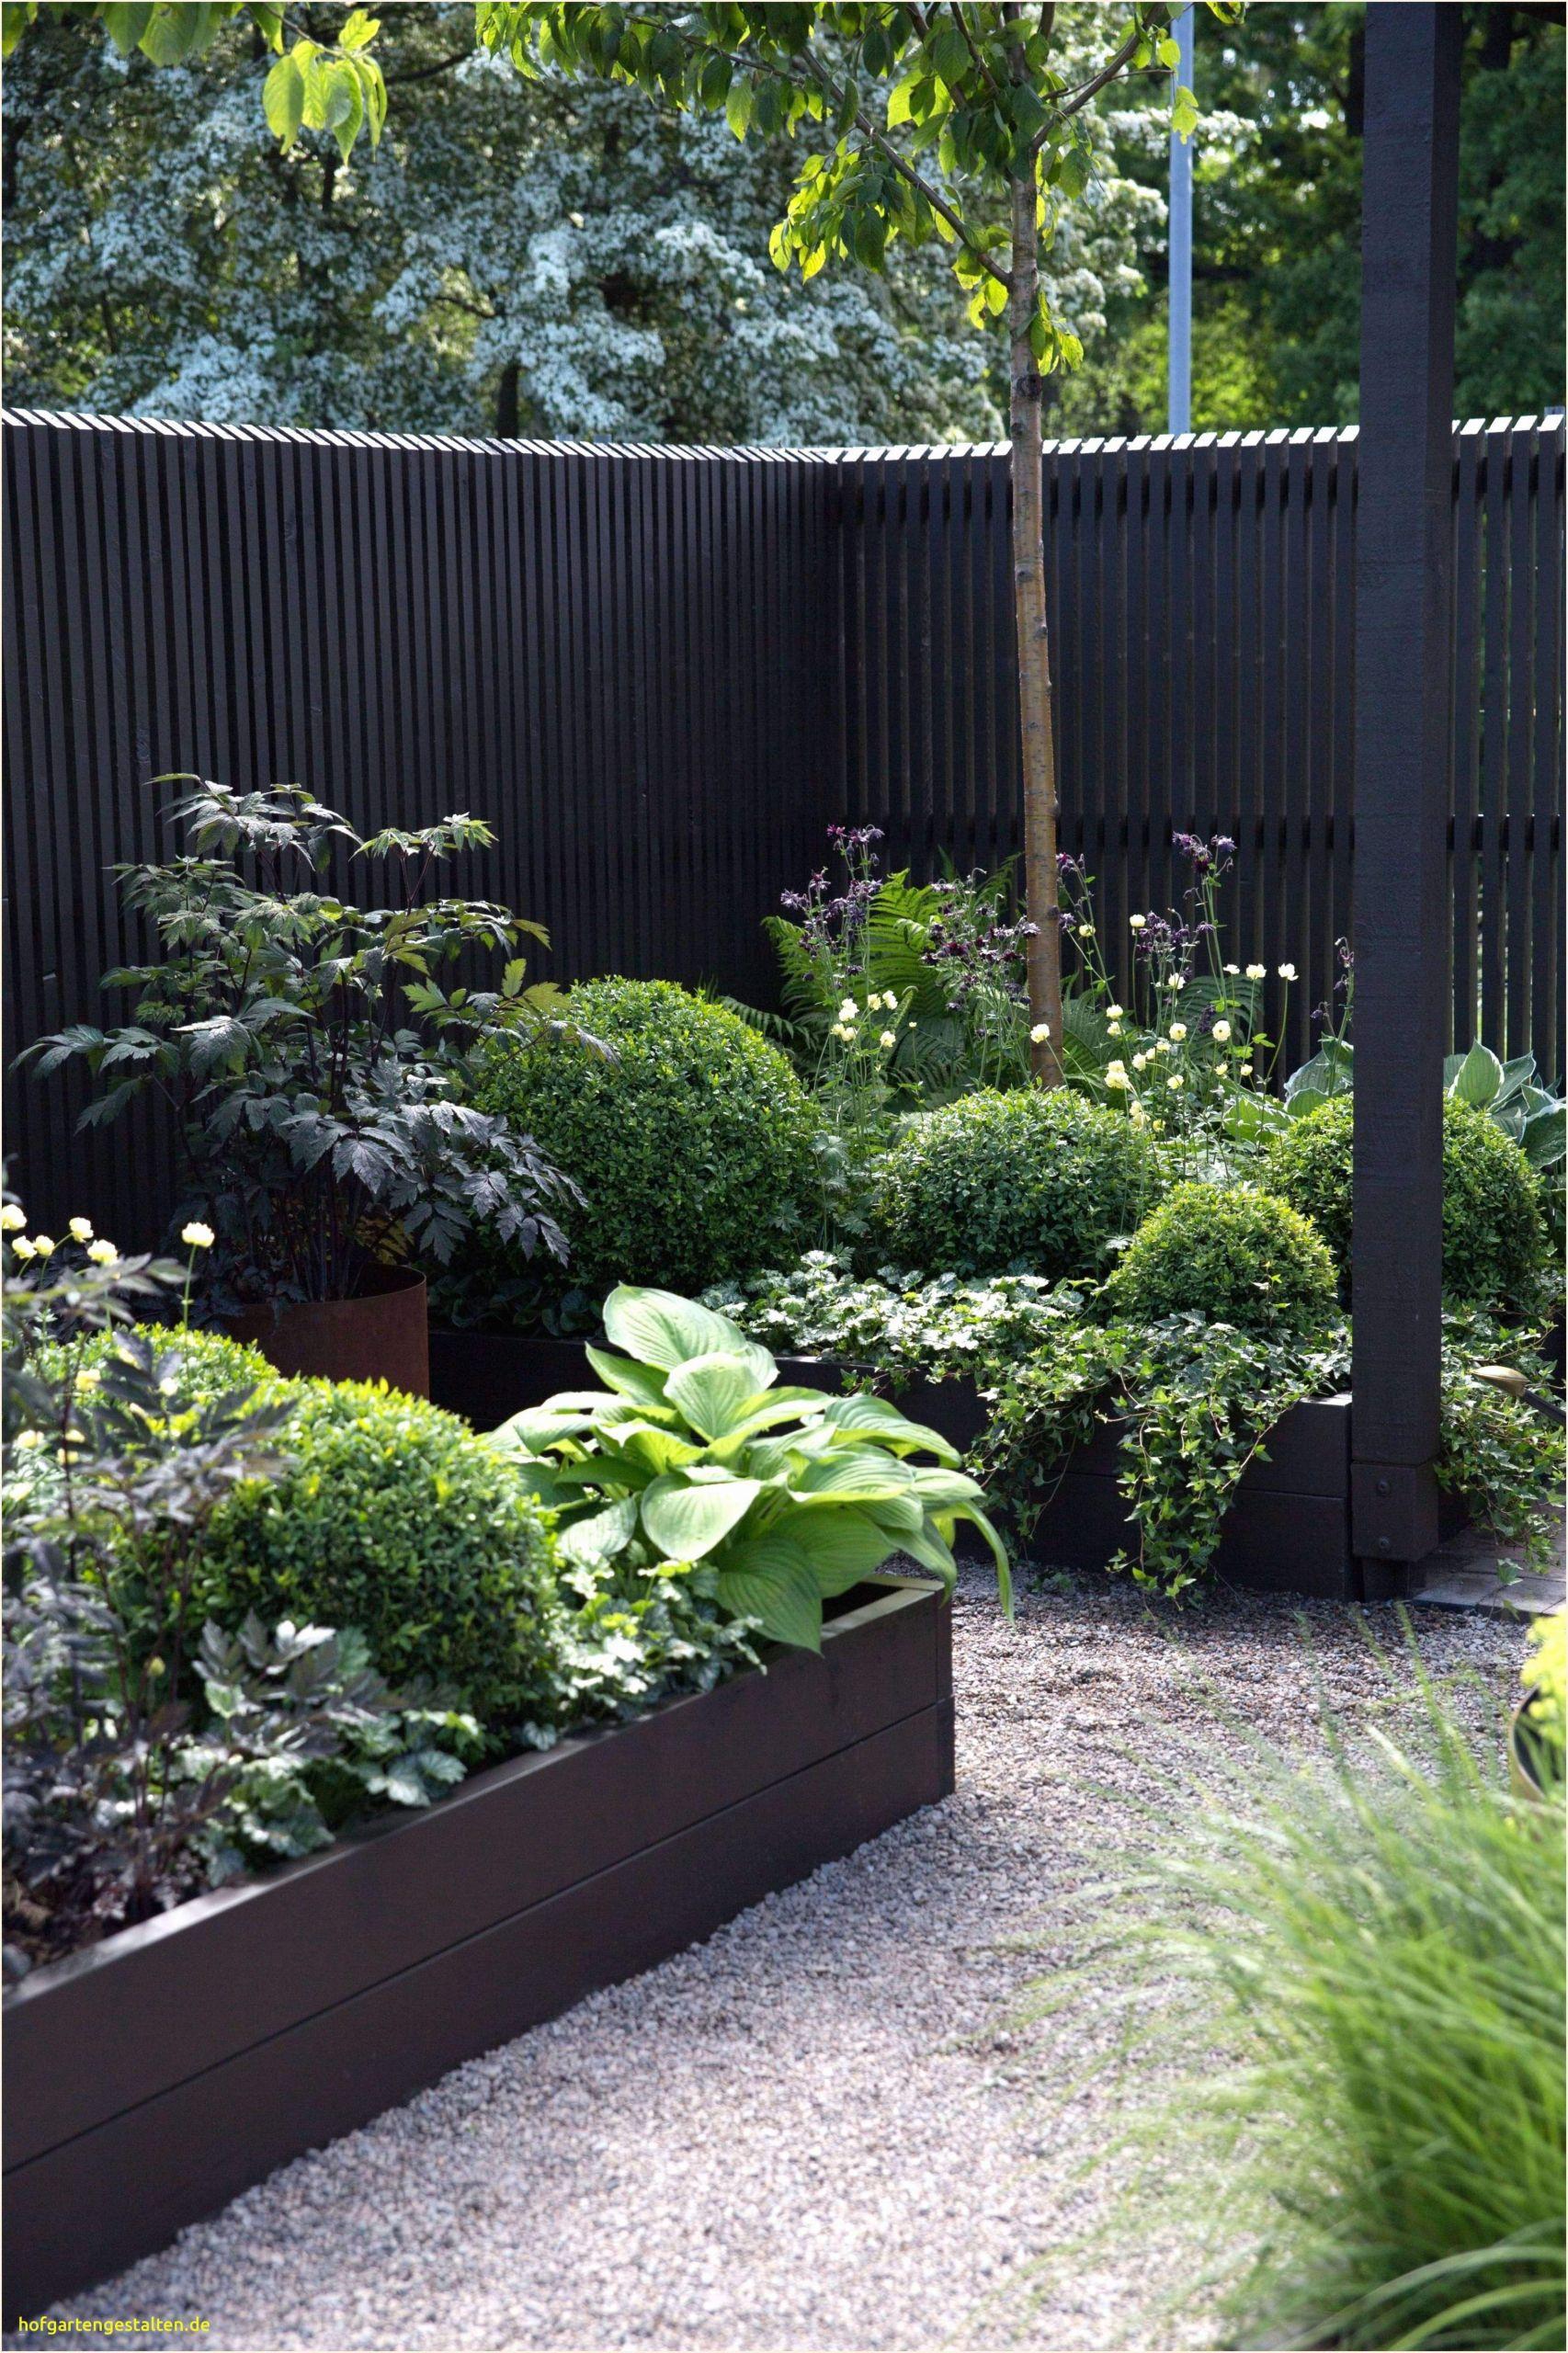 Vertikaler Garten Das Beste Von Vertikaler Garten Anleitung — Temobardz Home Blog